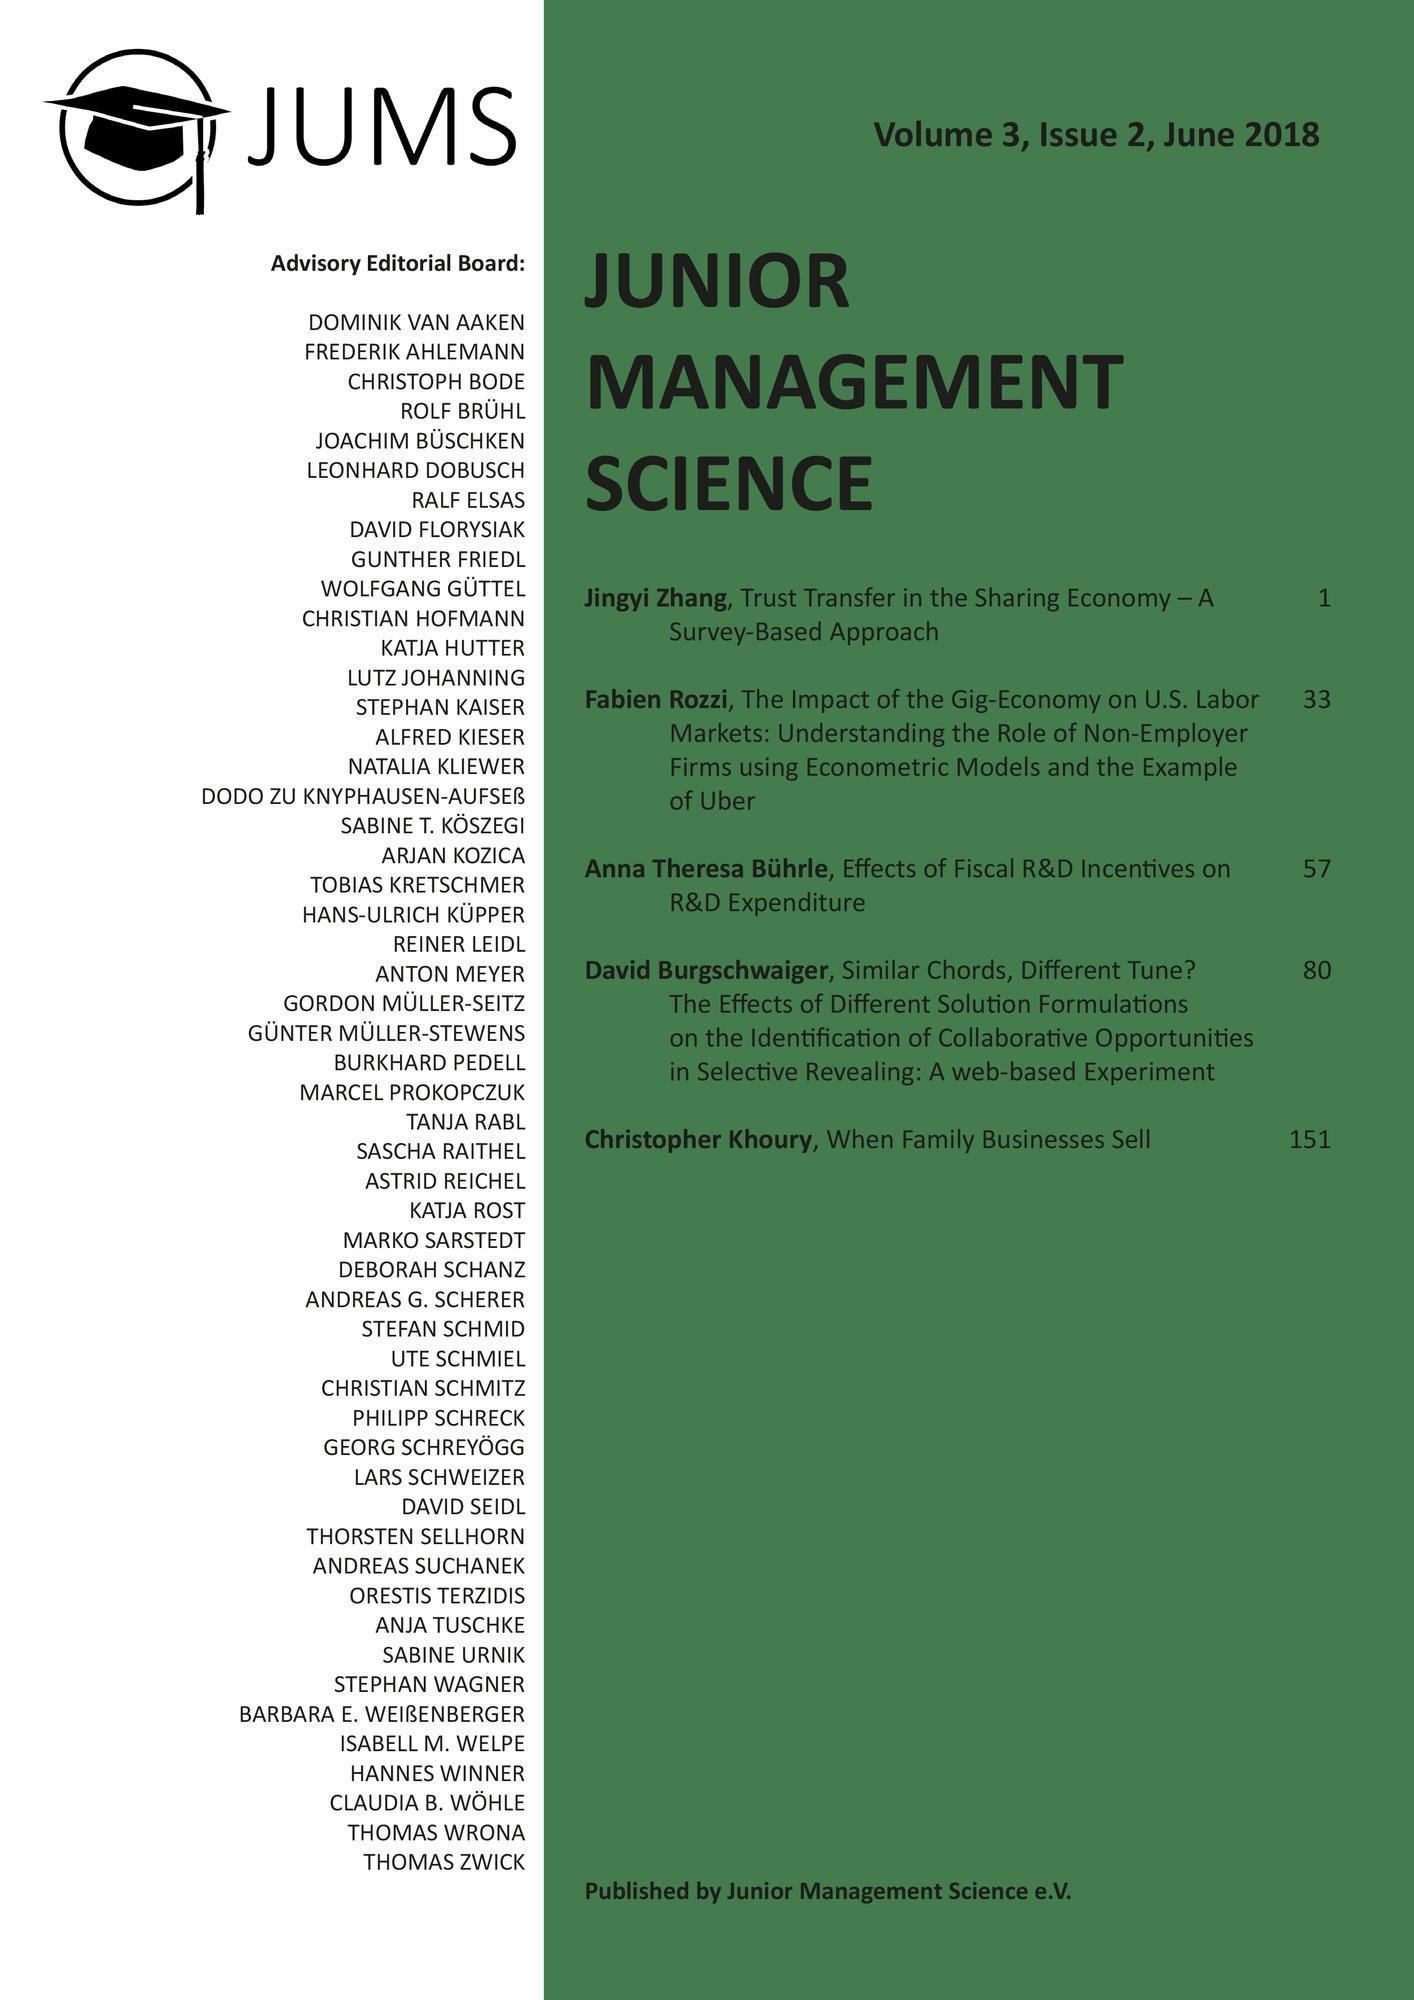 Titel: Junior Management Science, Volume 3, Issue 2, June 2018